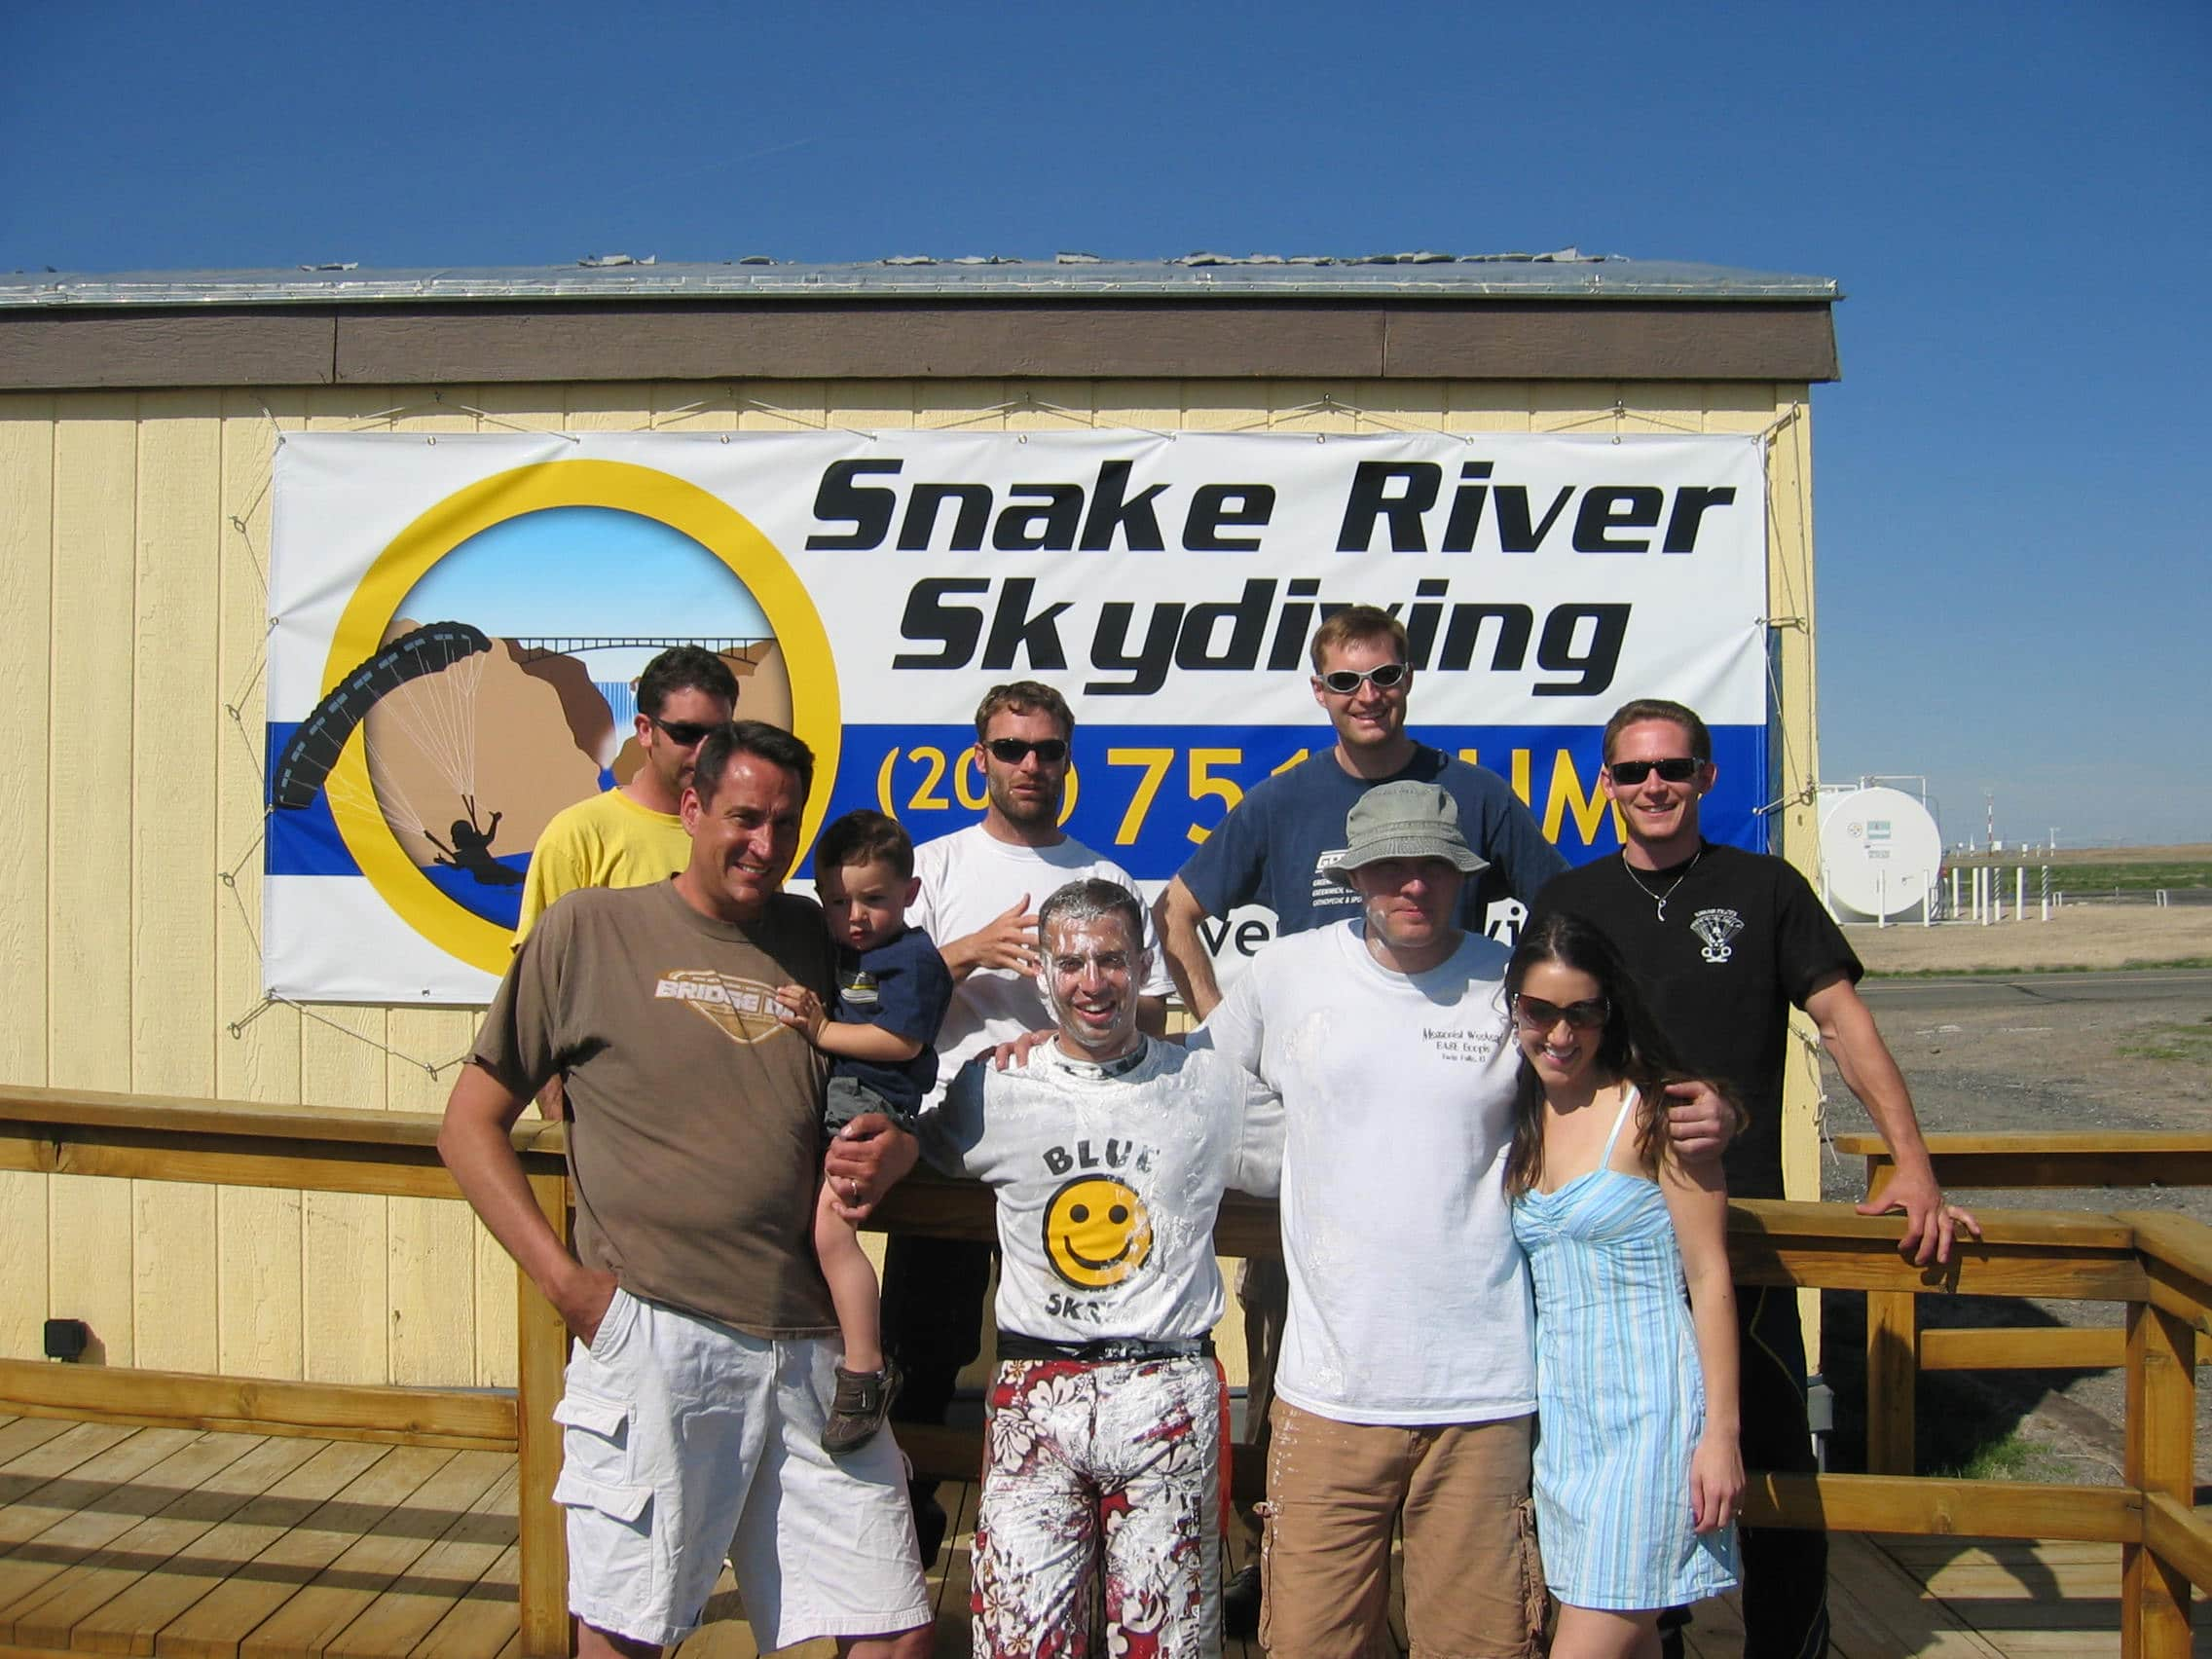 Abbie Mashaal at Snake River Skydiving